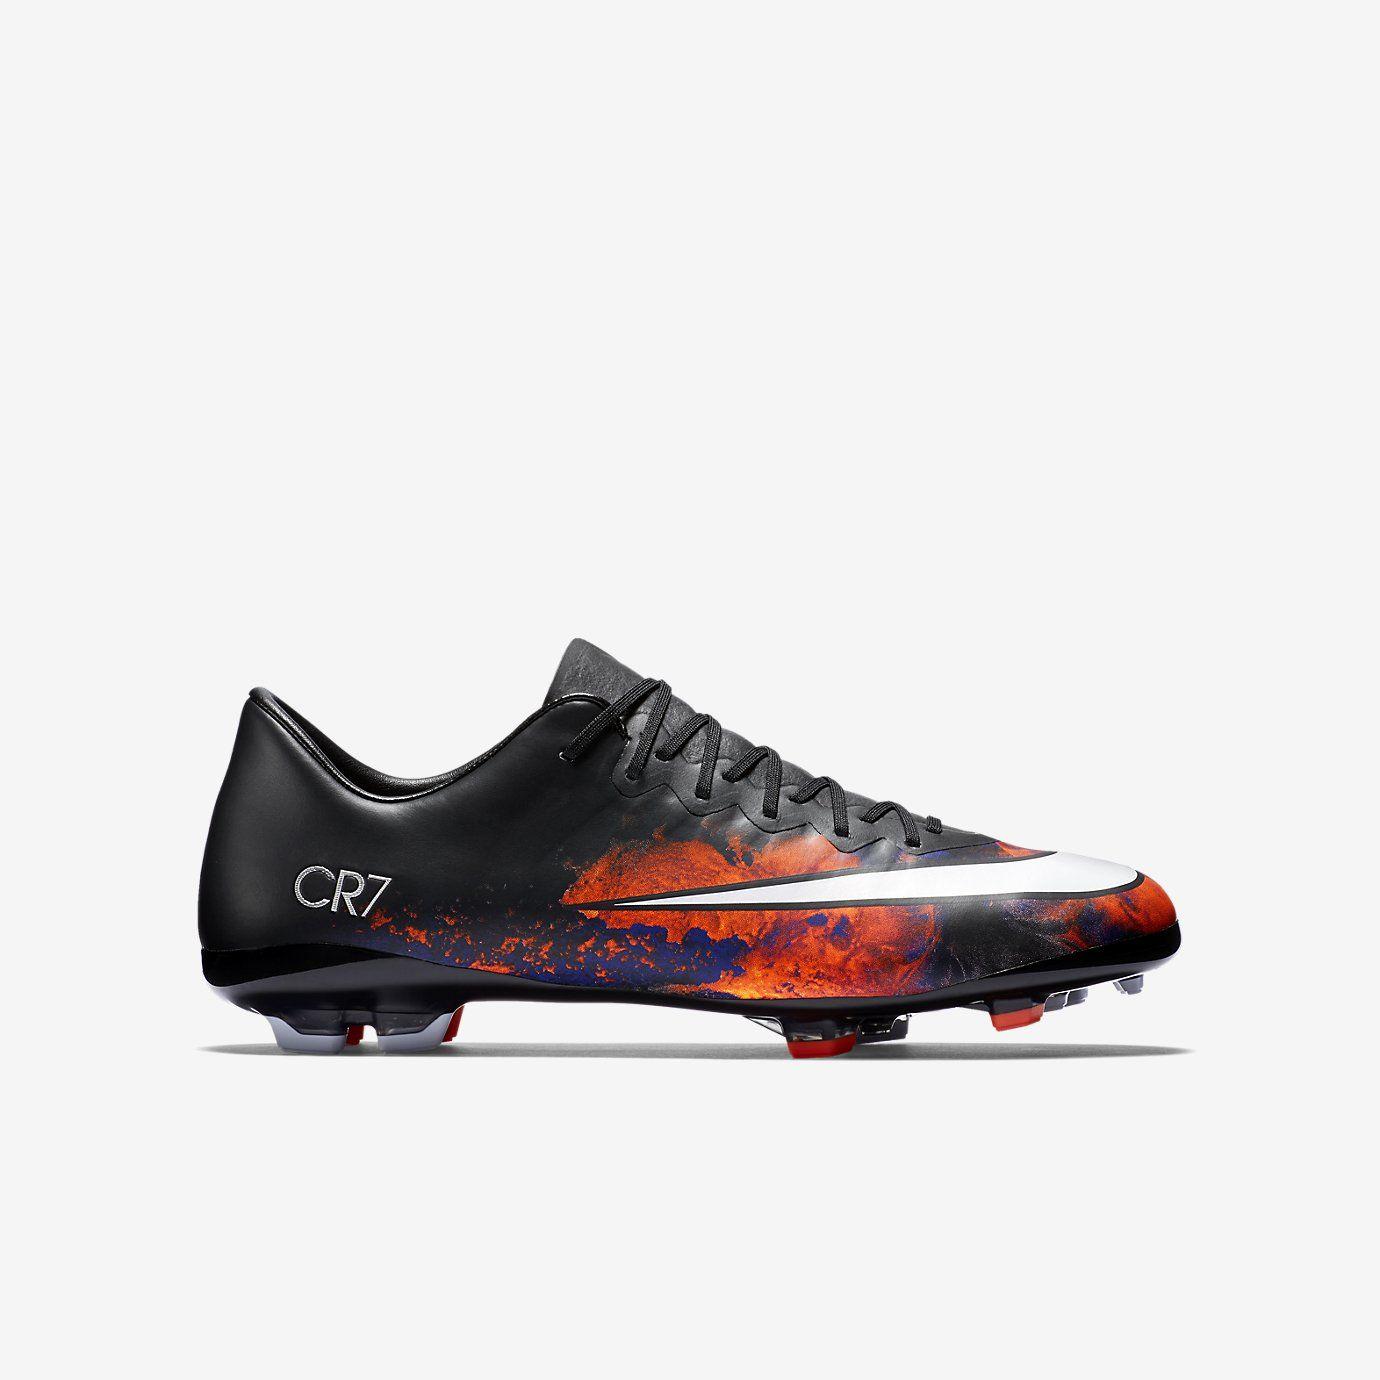 Nike Jr. Mercurial Vapor X CR7 Botas de fútbol para terreno firme - FG -  Niños. Nike.com (ES) 7beda68d005c3